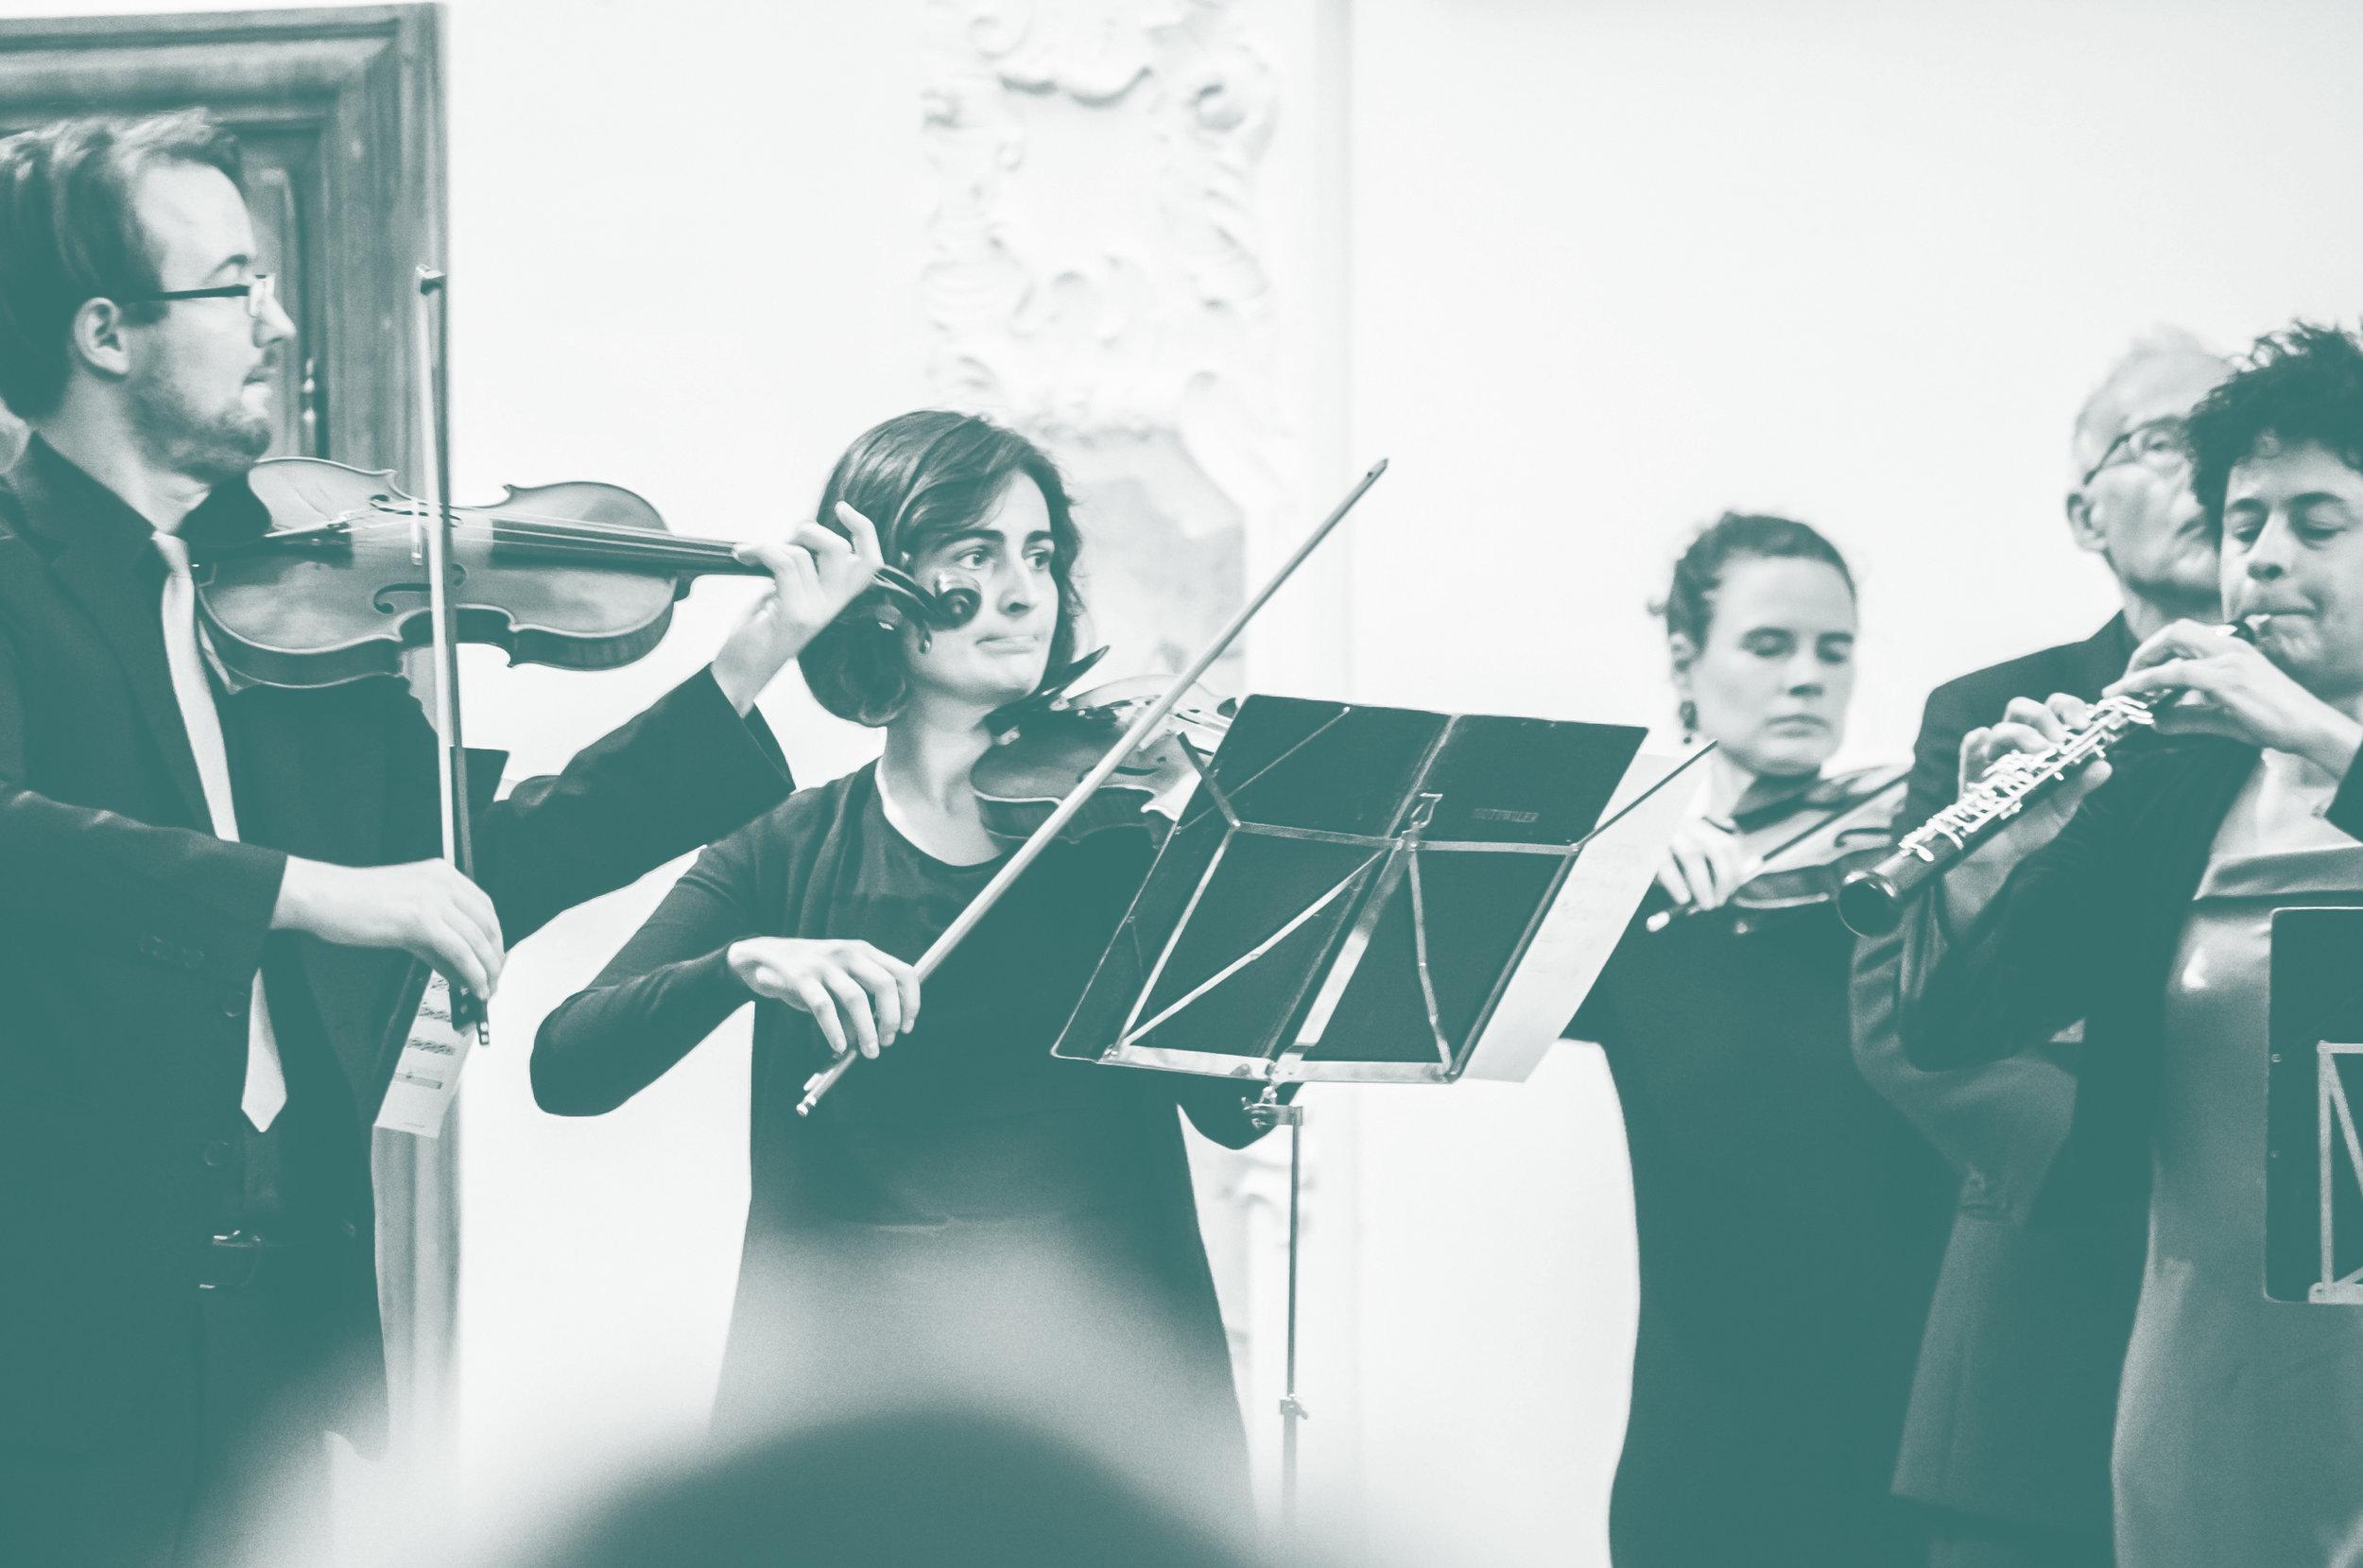 17_09_Herbstkonzert Kammerorchester Huttwil_BO-36_sw.jpg